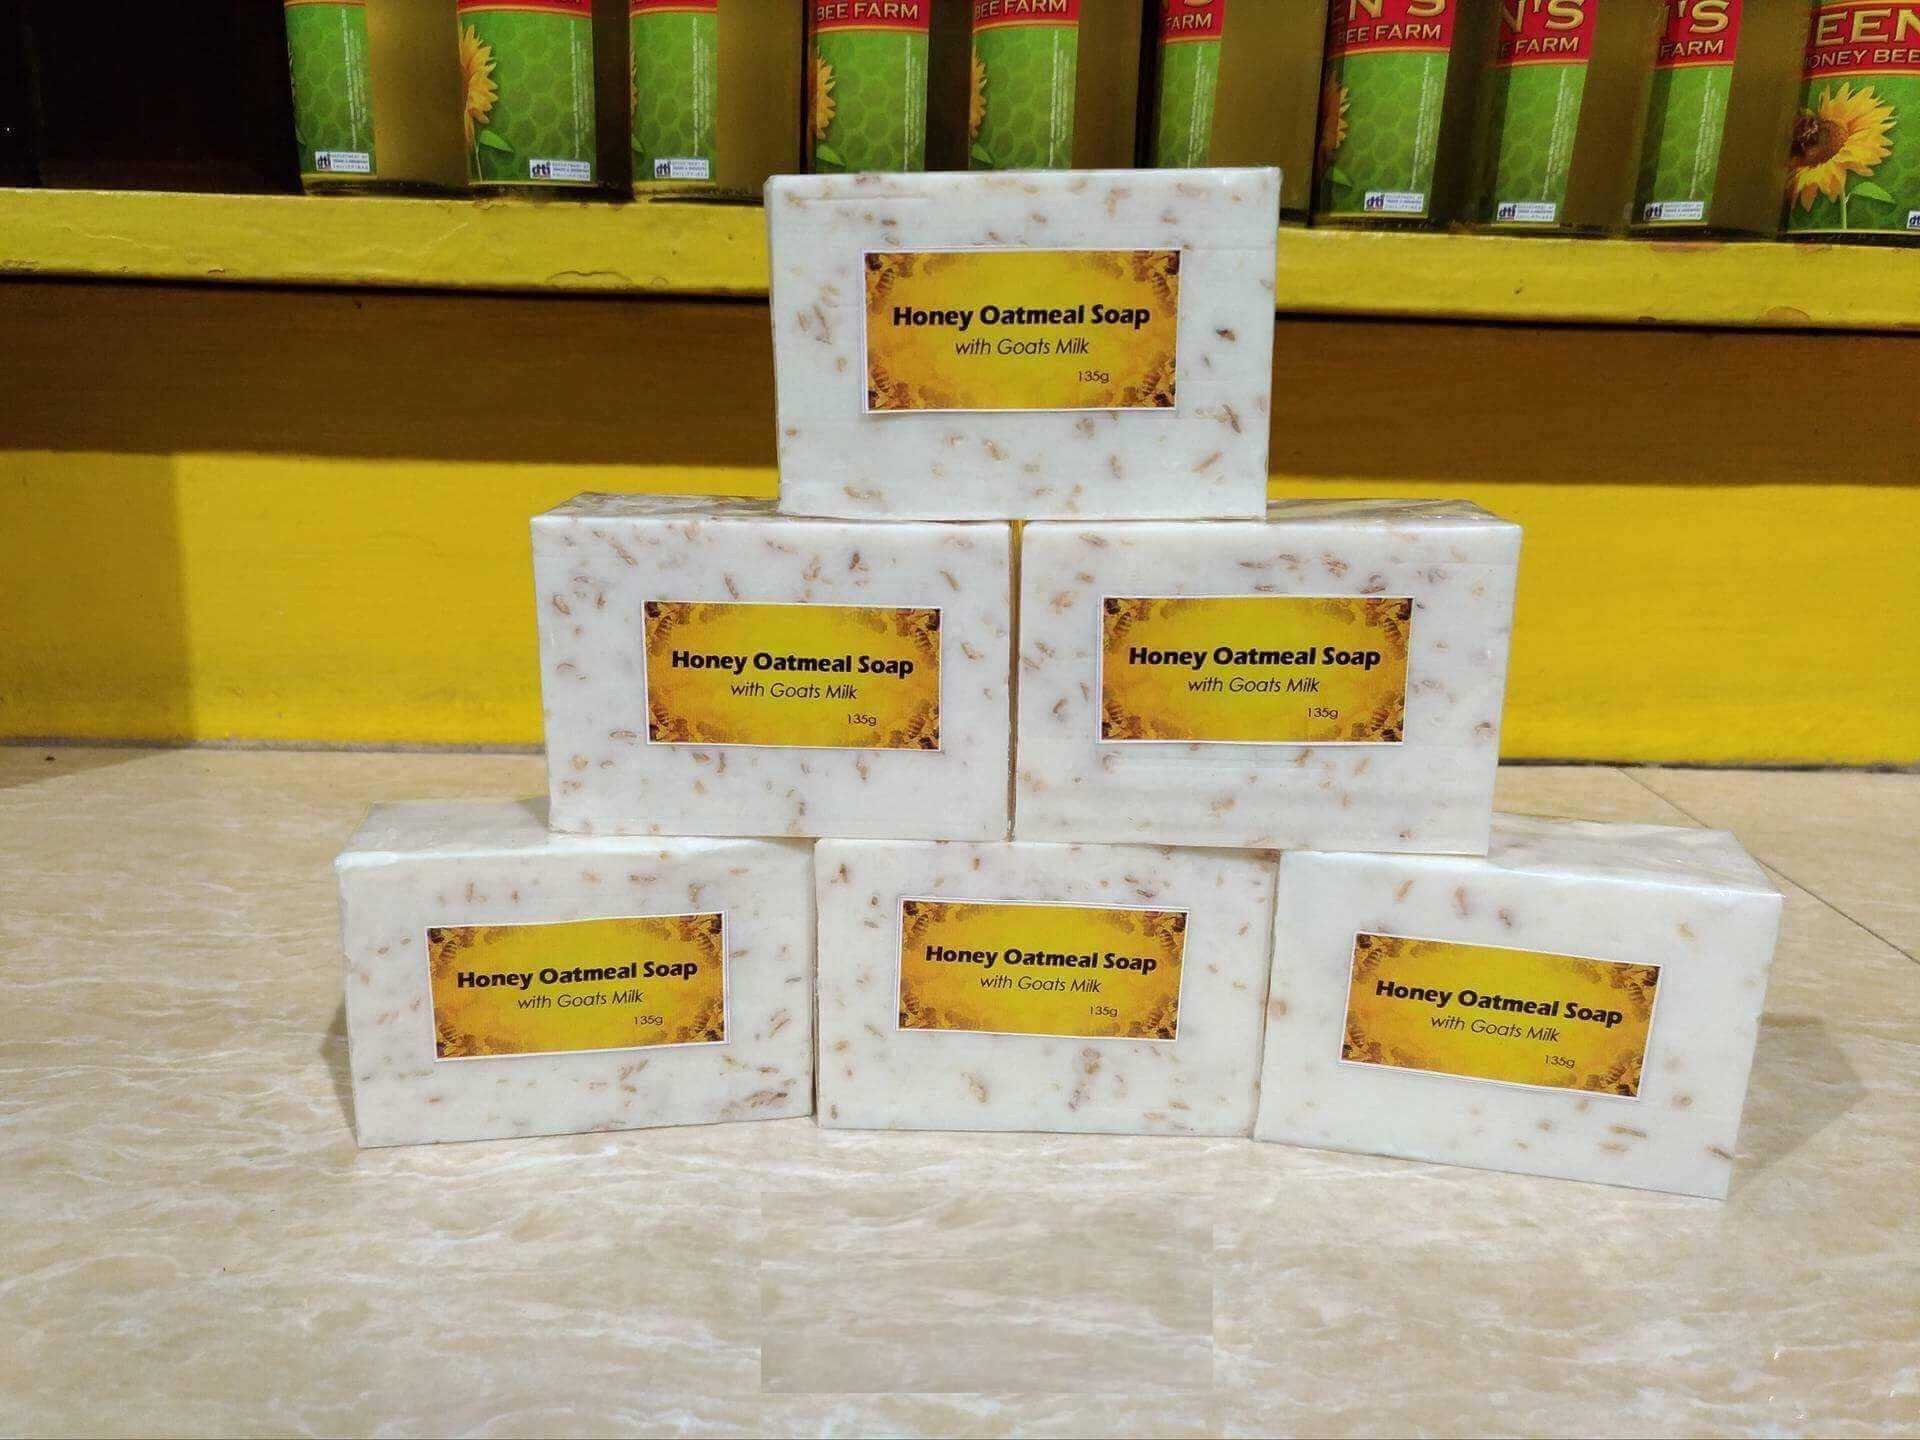 Honey Oatmeal Soap with goats milk - 135g